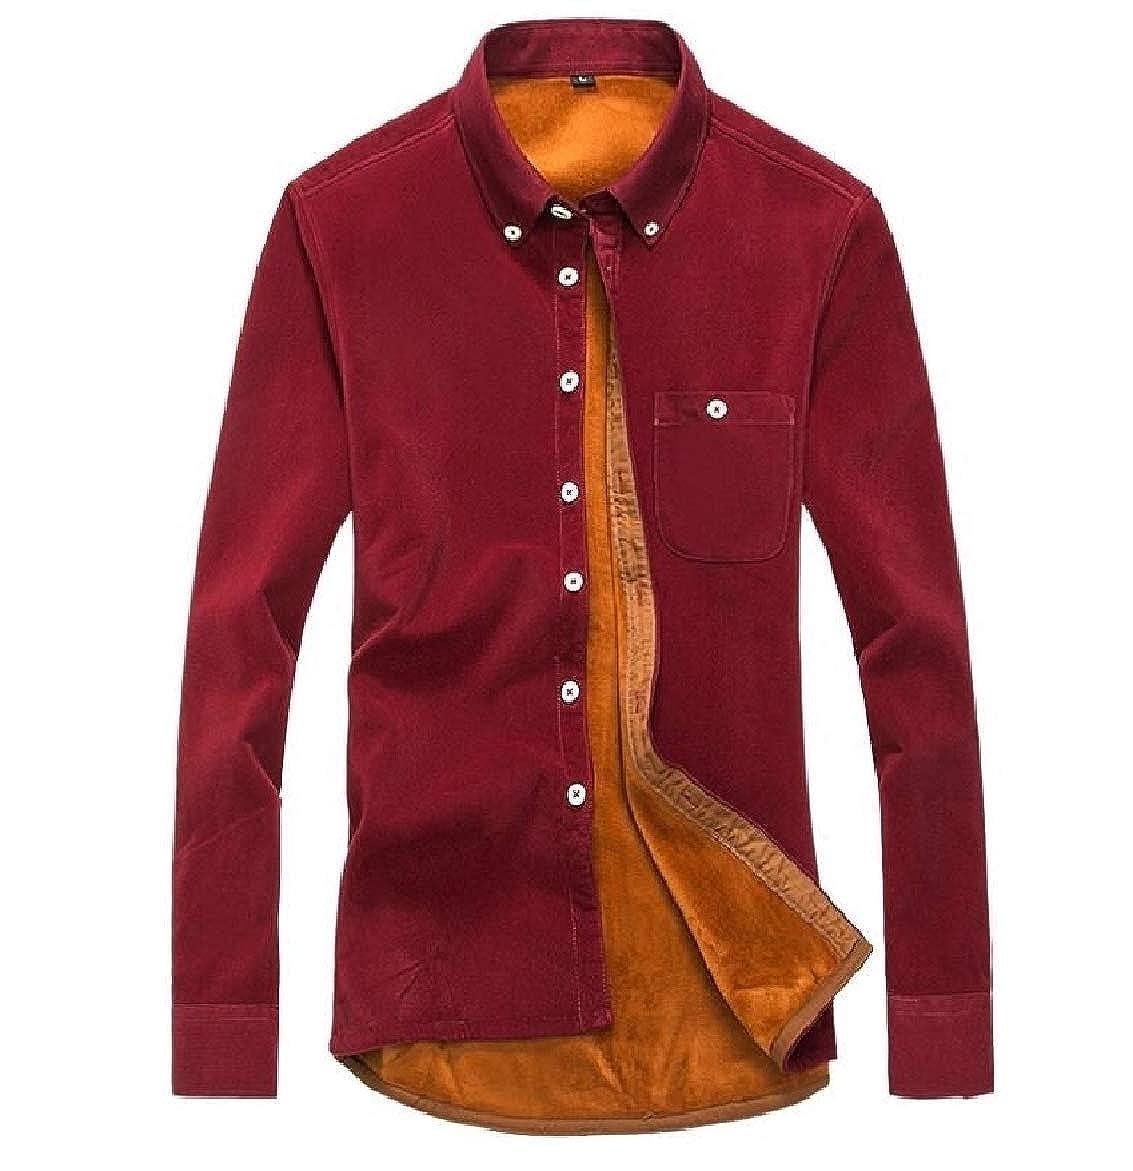 SportsX Men Corduroy Plus Size Leisure Plus Velvet Button Down Shirt